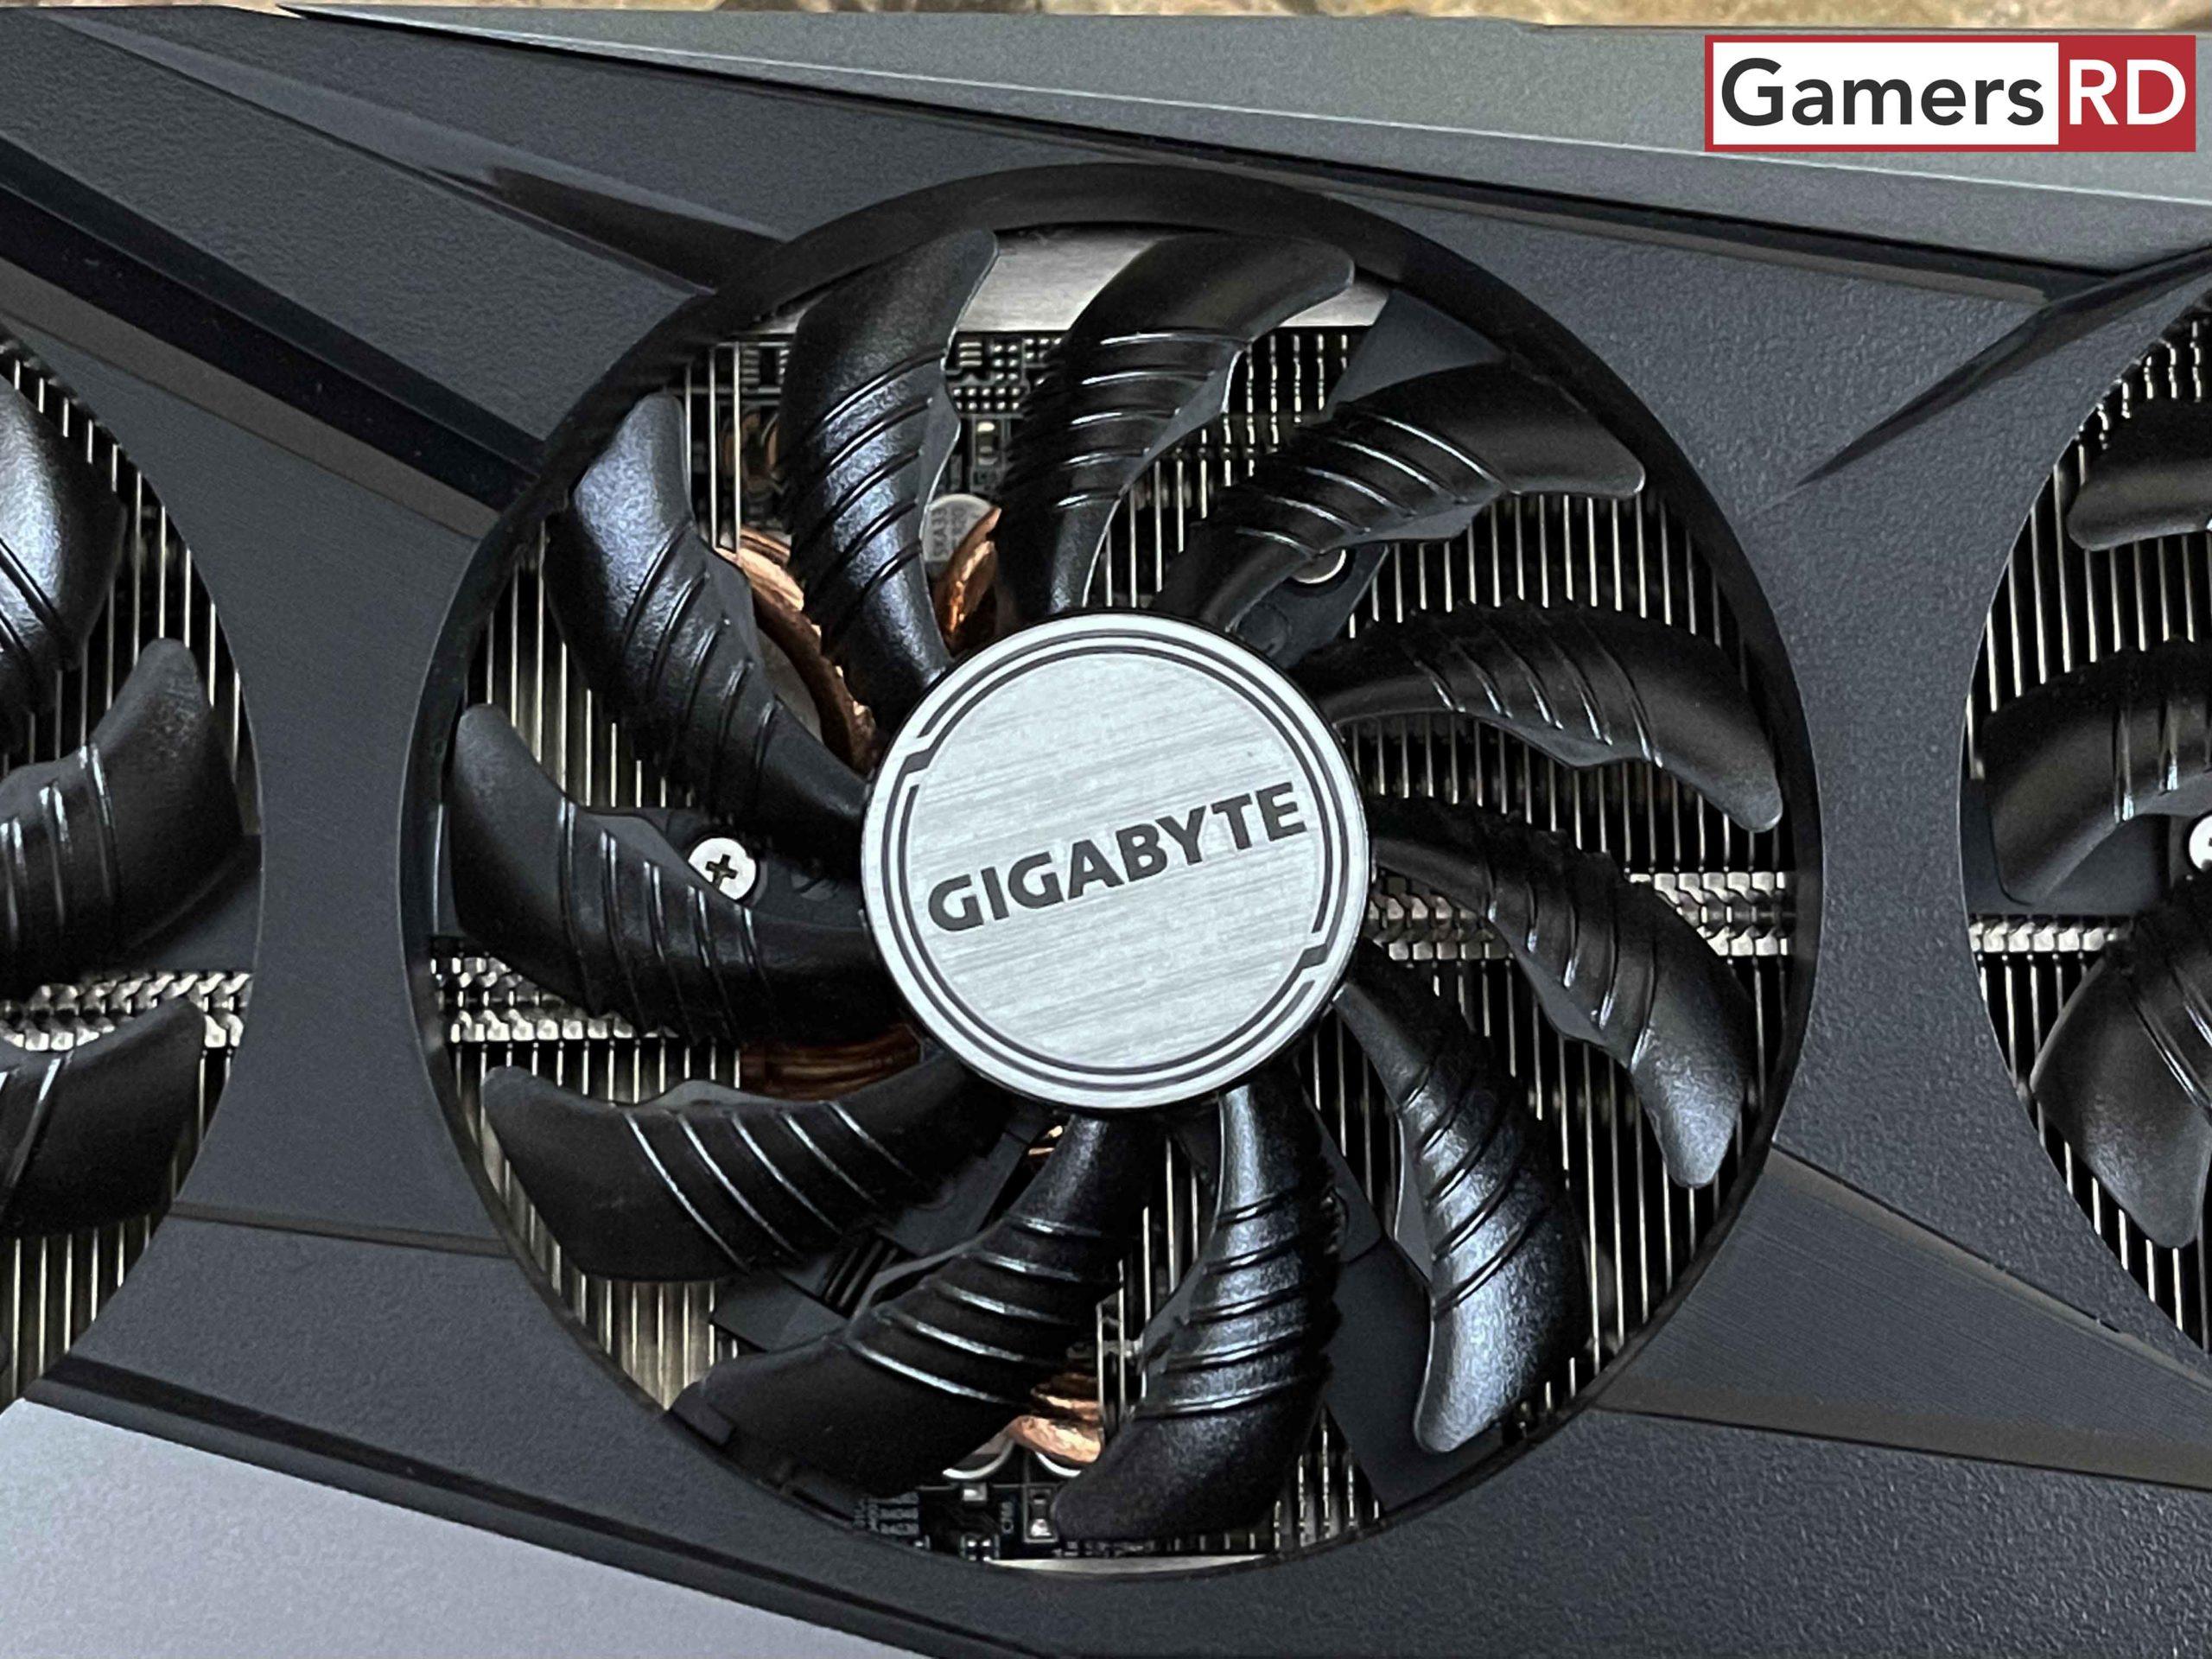 AMD Radeon RX 6600 XT GIGABYTE OC REVIEW 5 GAMERSRD